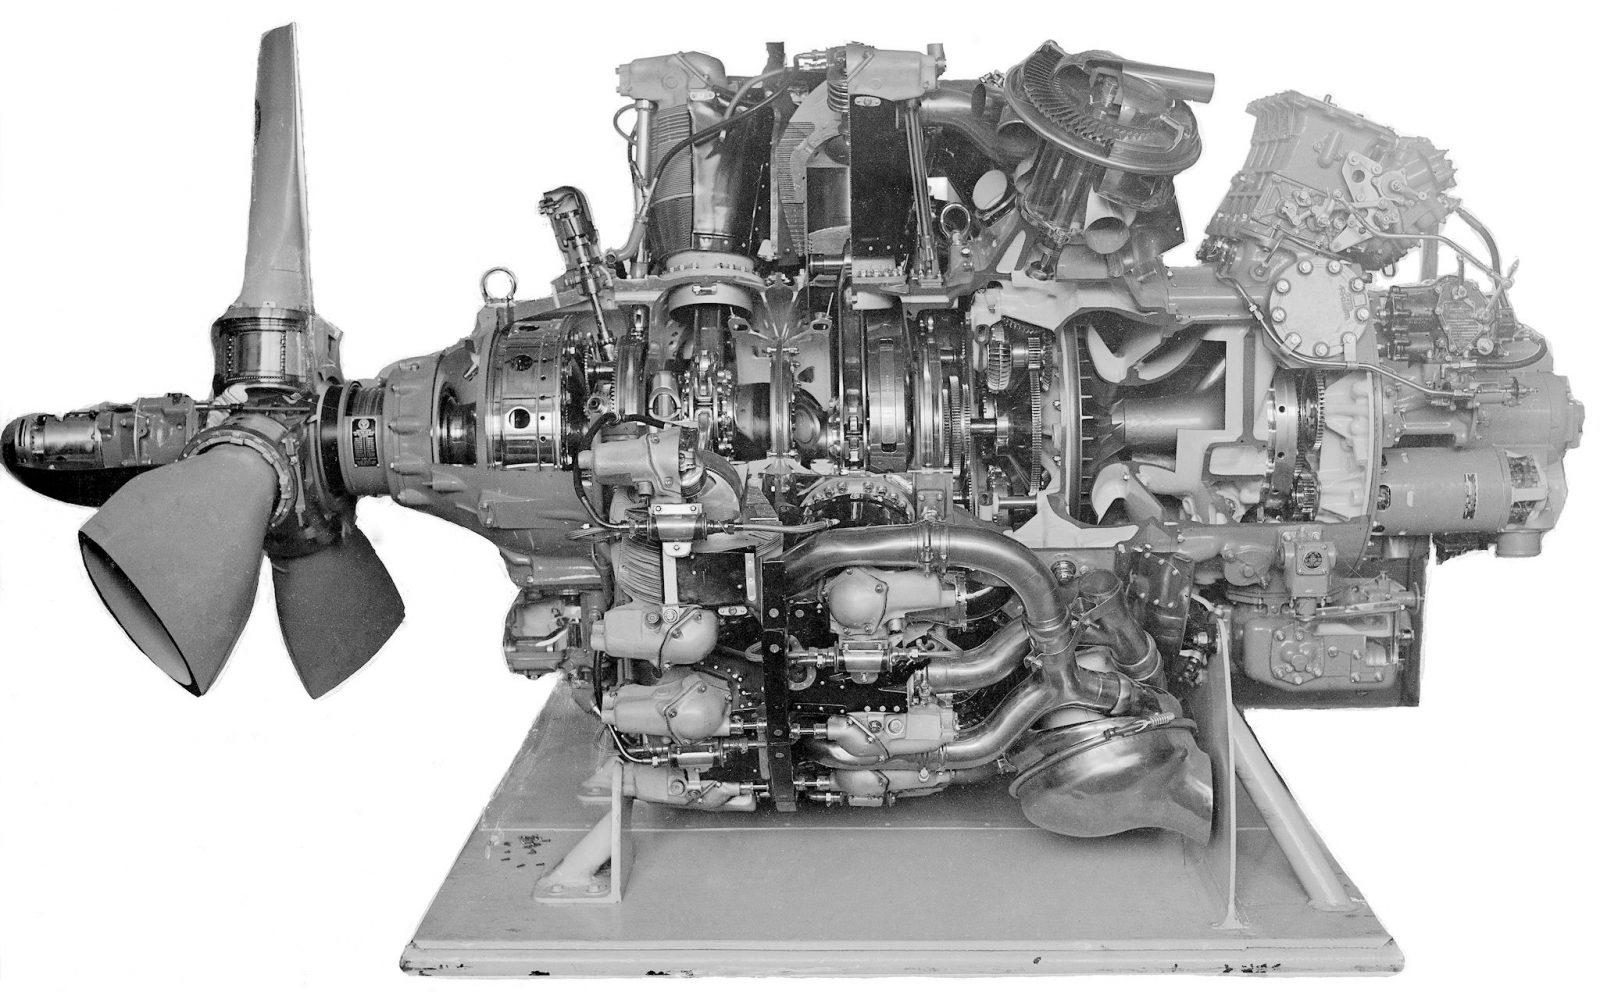 Самый мощный авиационный двигатель